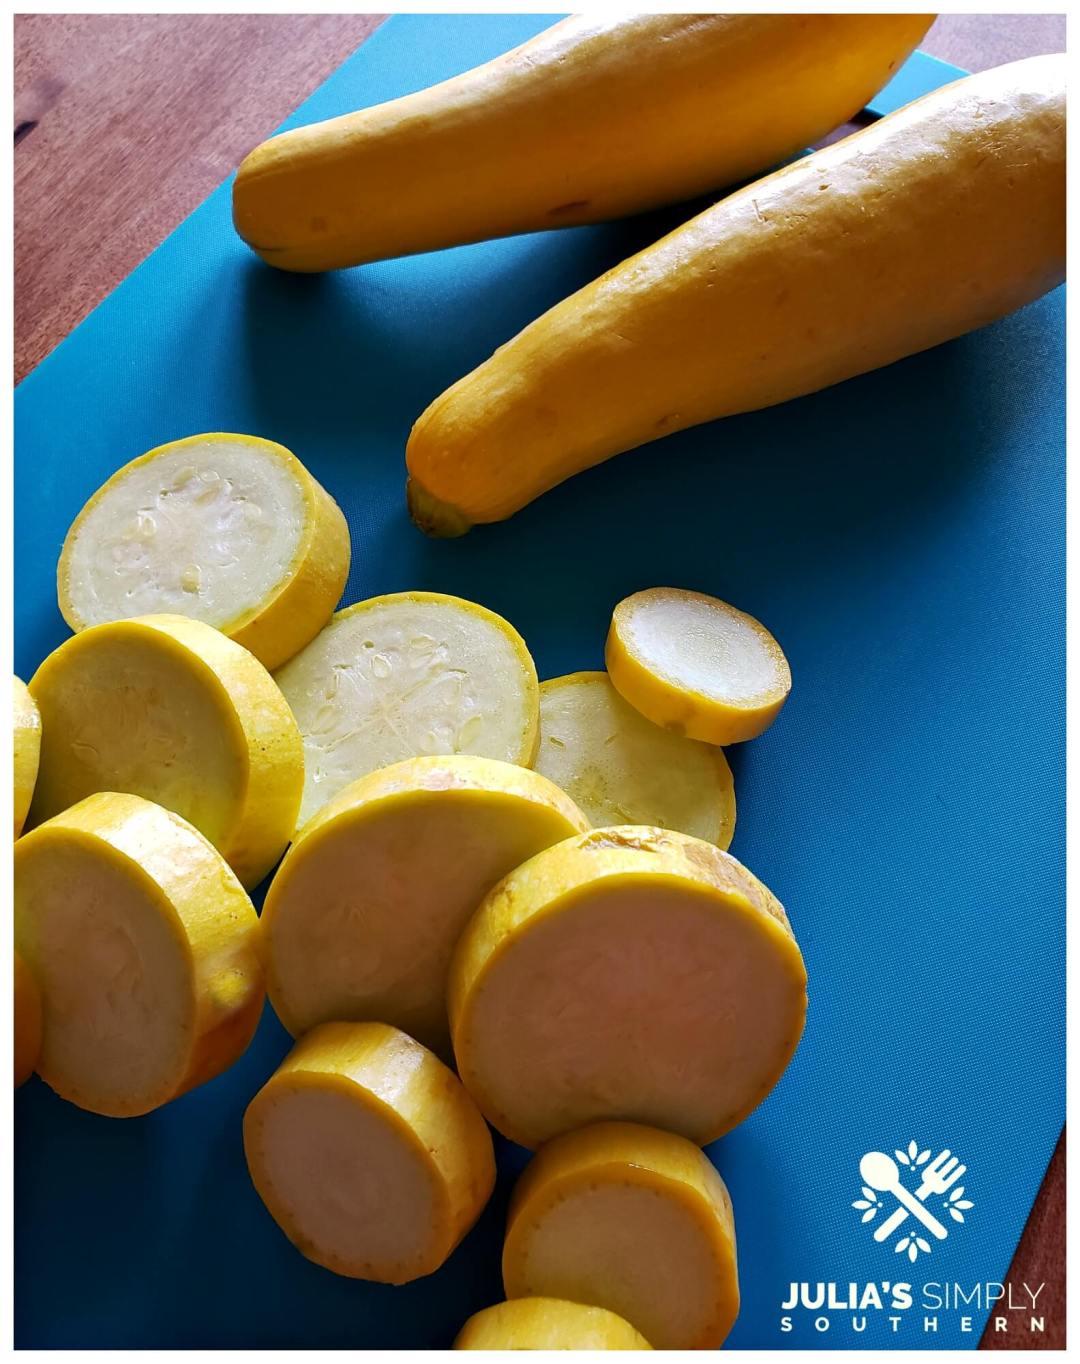 Locally grown farm to table yellow summer squash